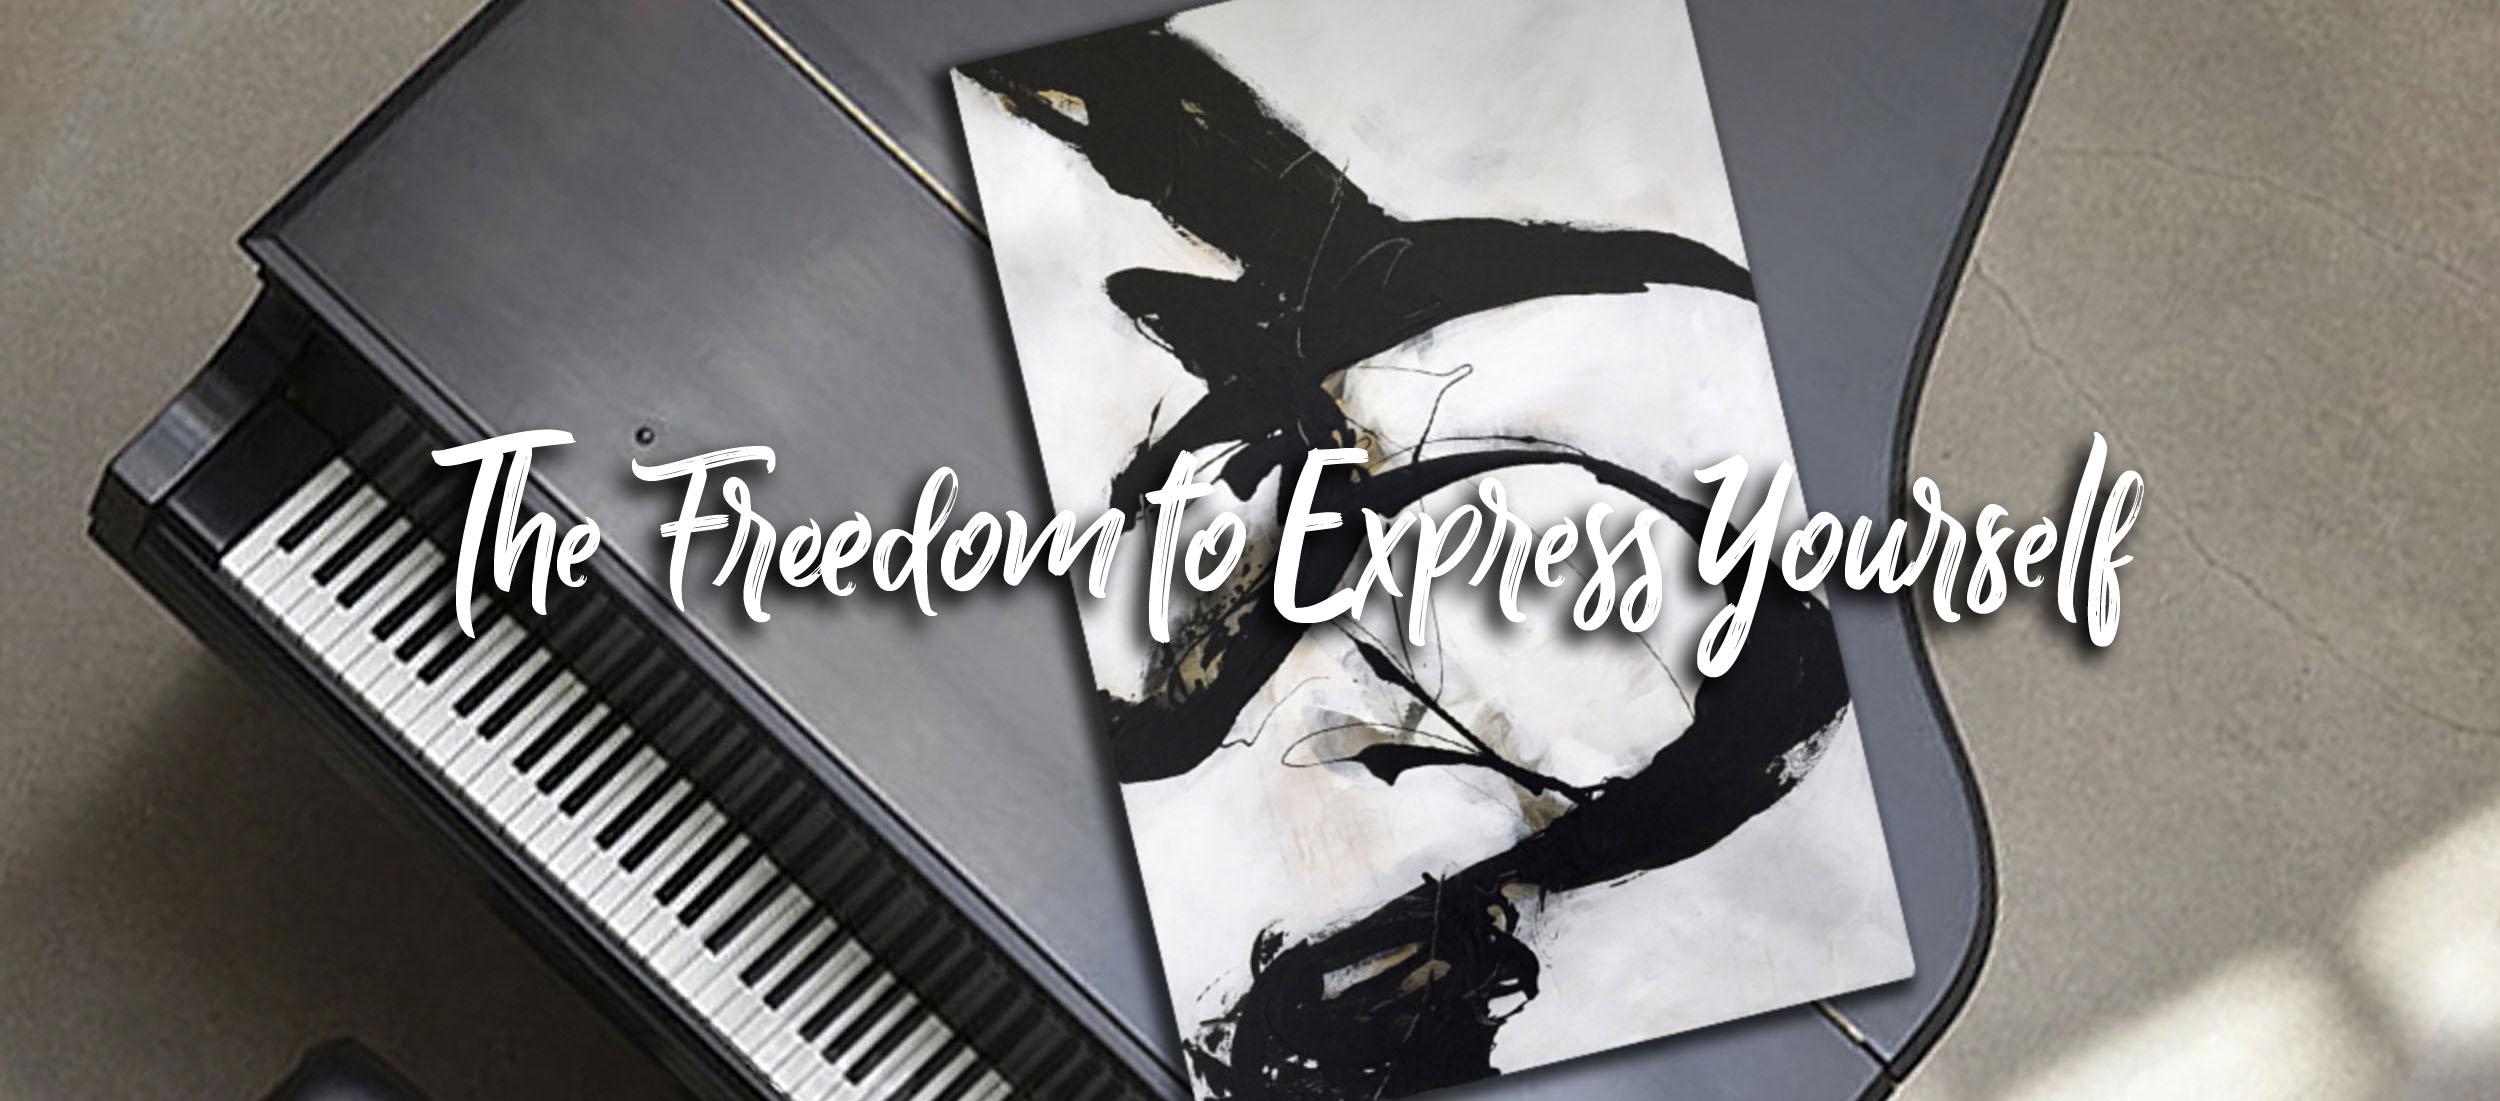 Lynette-Melnyk-Freedom-to-express-yourself.jpg